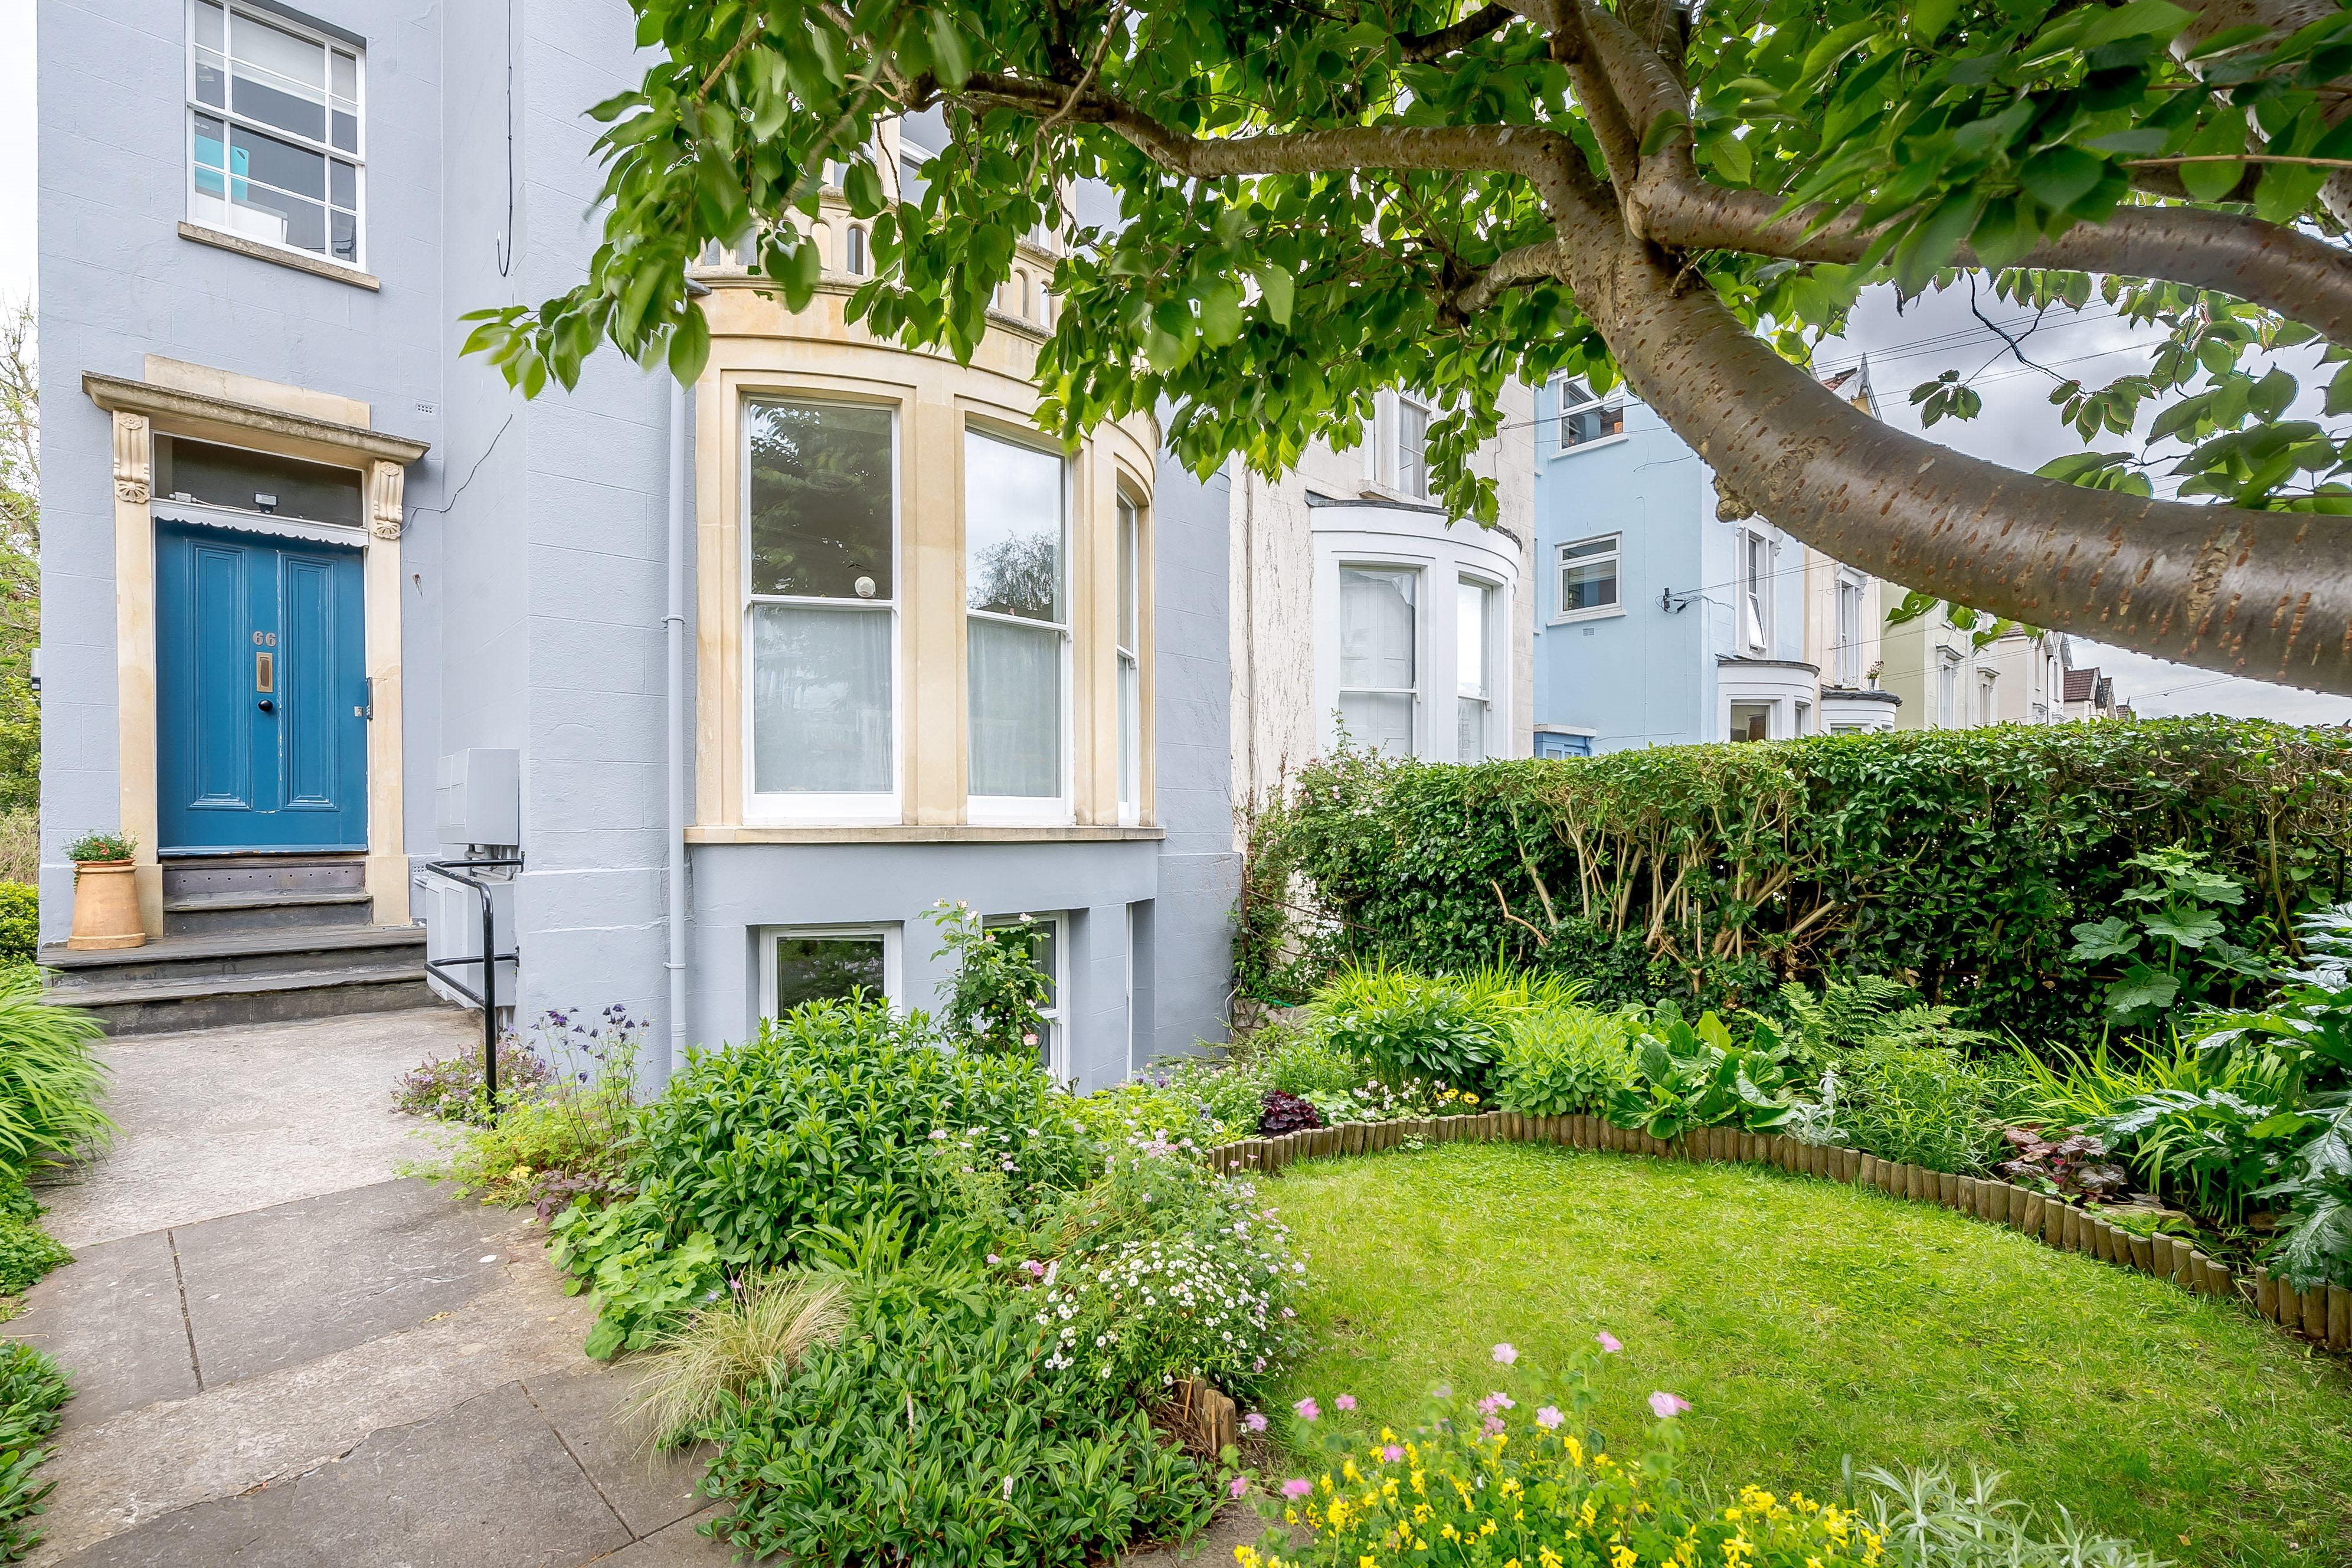 2 bed flat for sale in 66 Hampton Park, Redland - Property Image 1